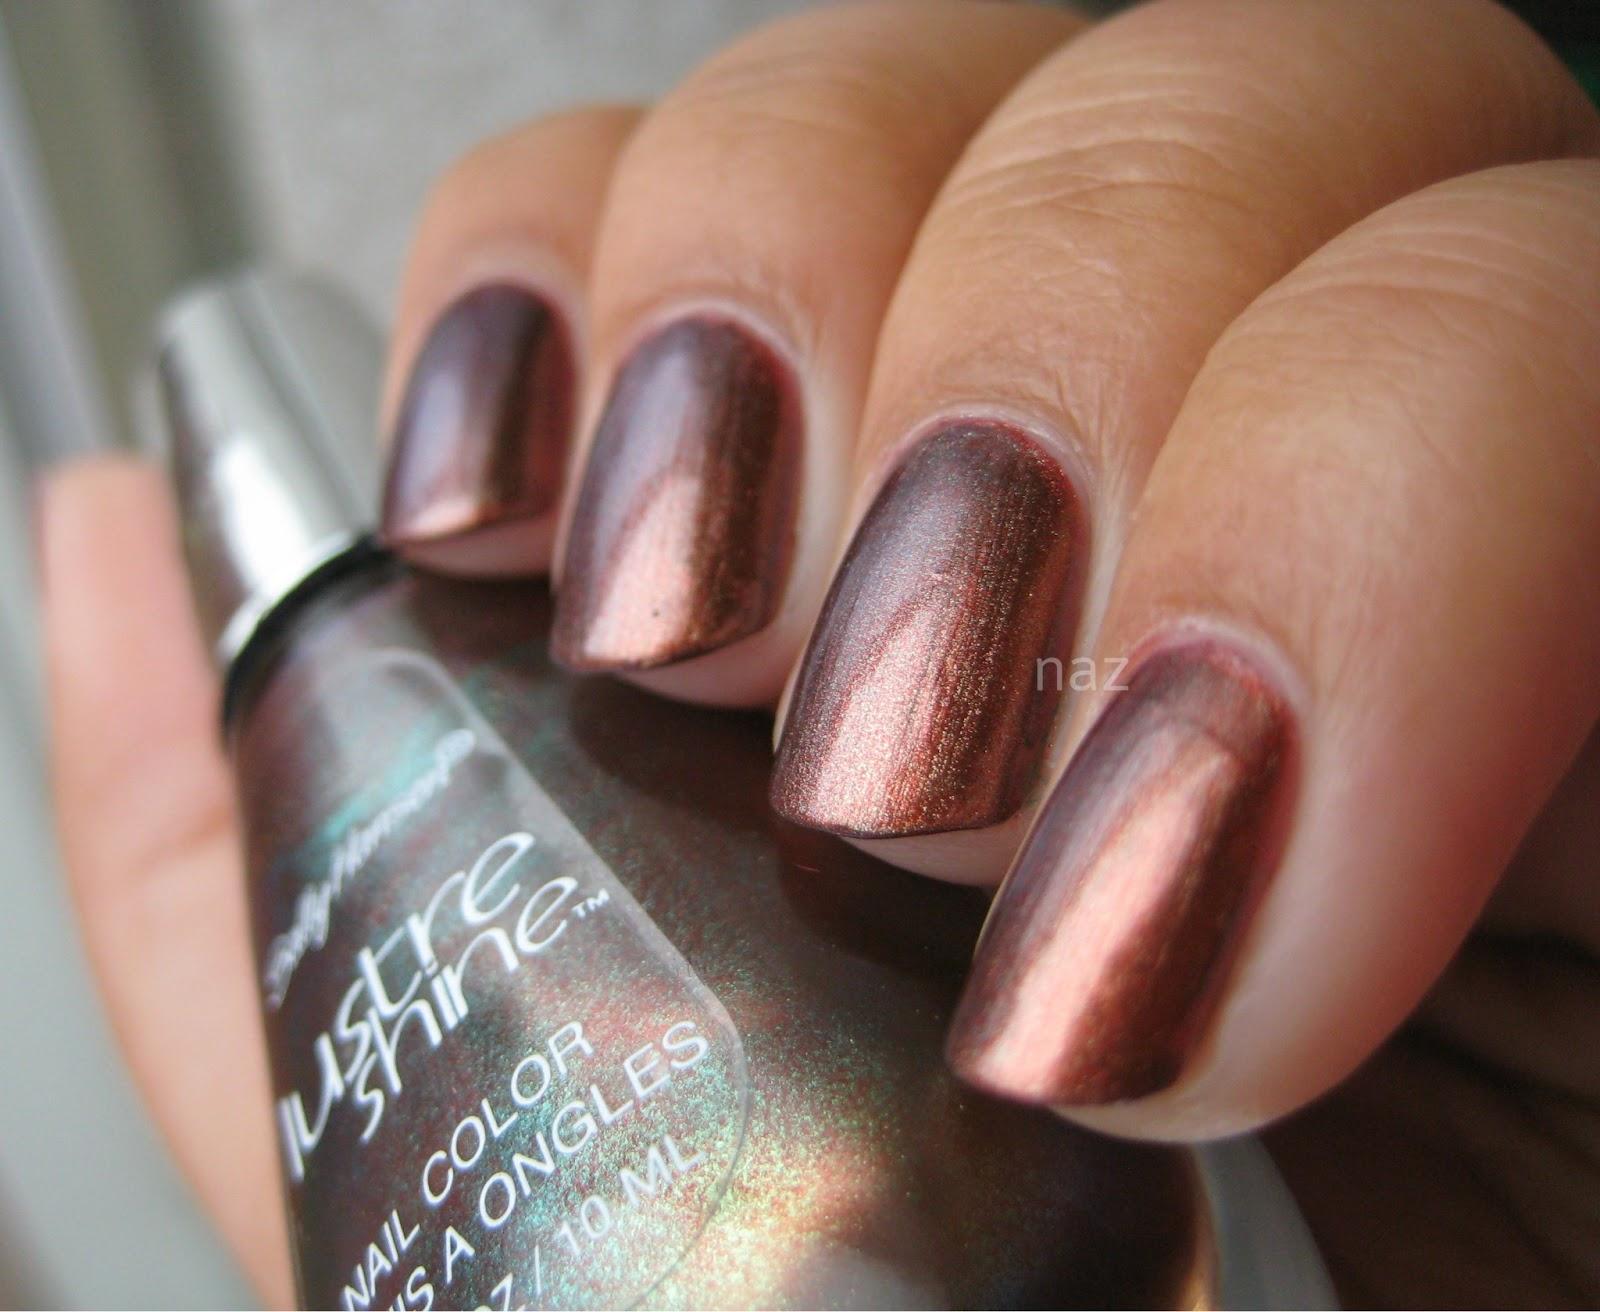 Naz\'s Nails: Sally Hansen Lustre Shine Copperhead